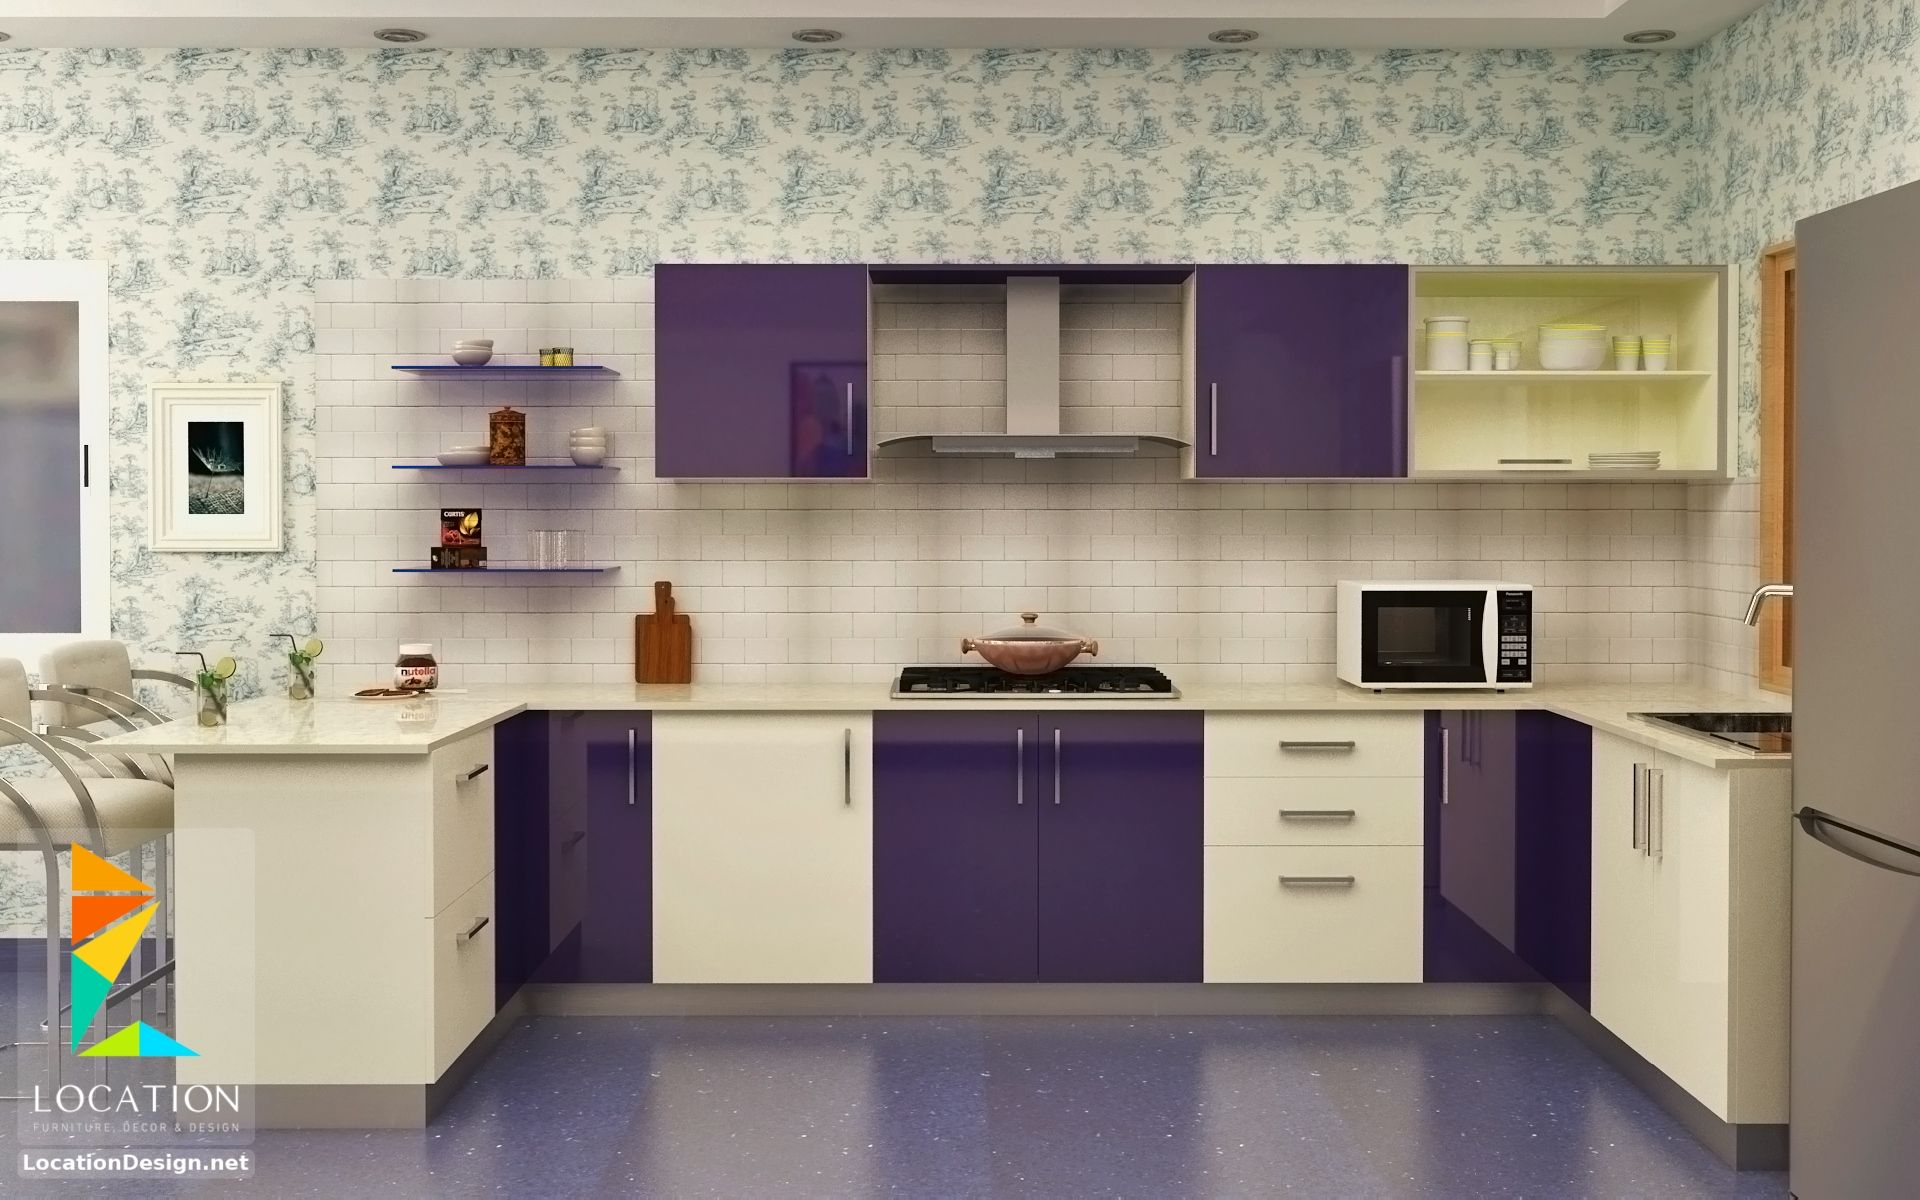 exclusive wonderful purple kitchen ideas | مطابخ - اشكال و افكار المطابخ الجديدة لعام 2018 | Kitchen ...